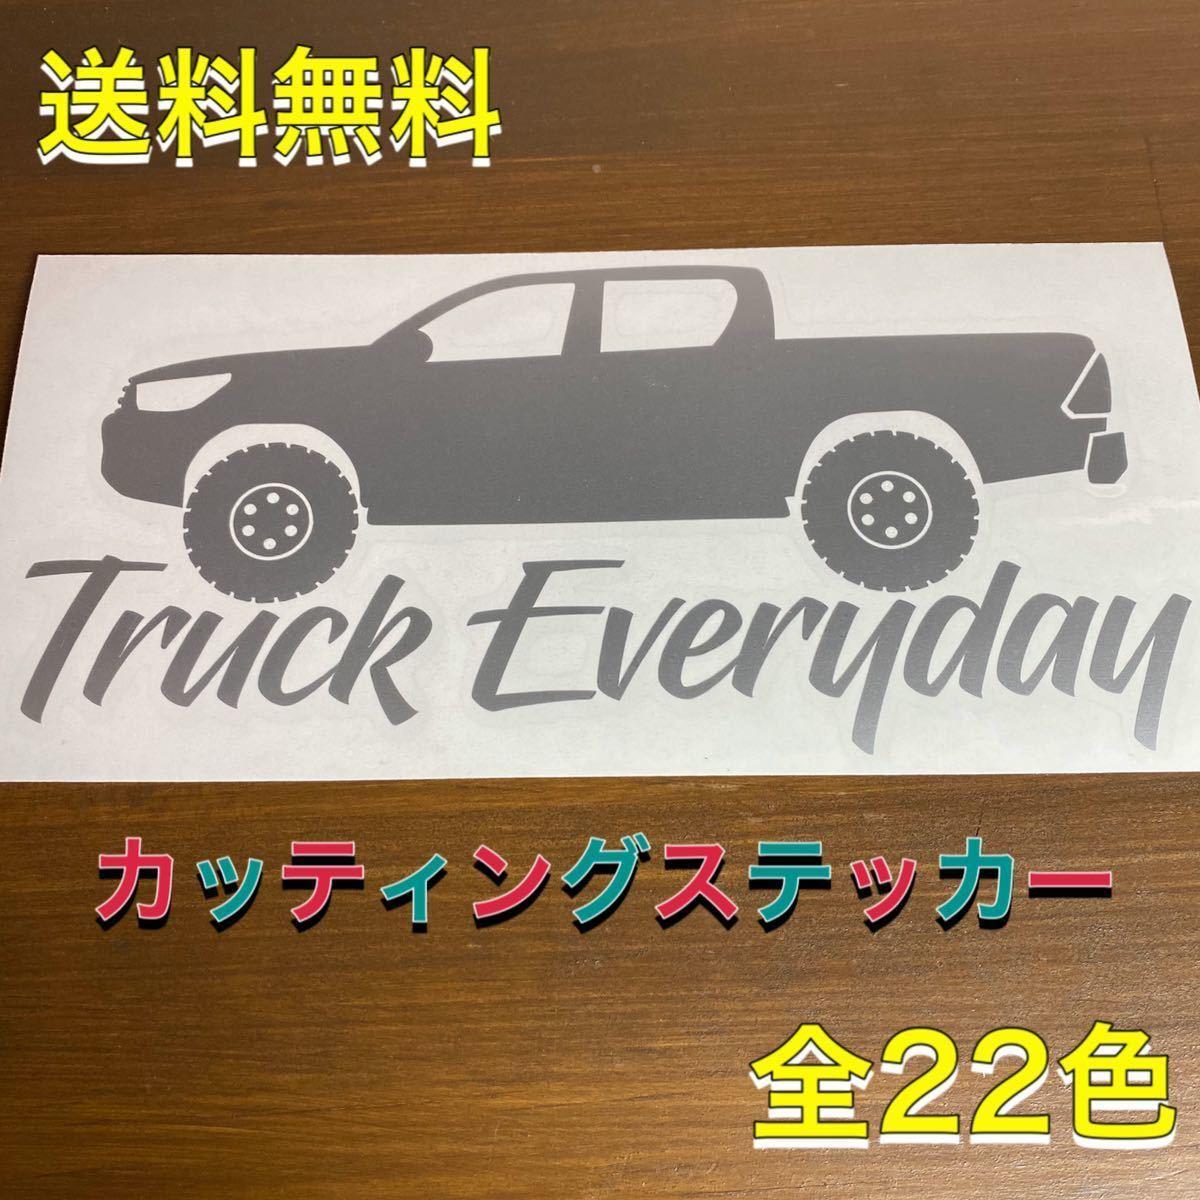 Truck Everyday ハイラックス ステッカー_画像1